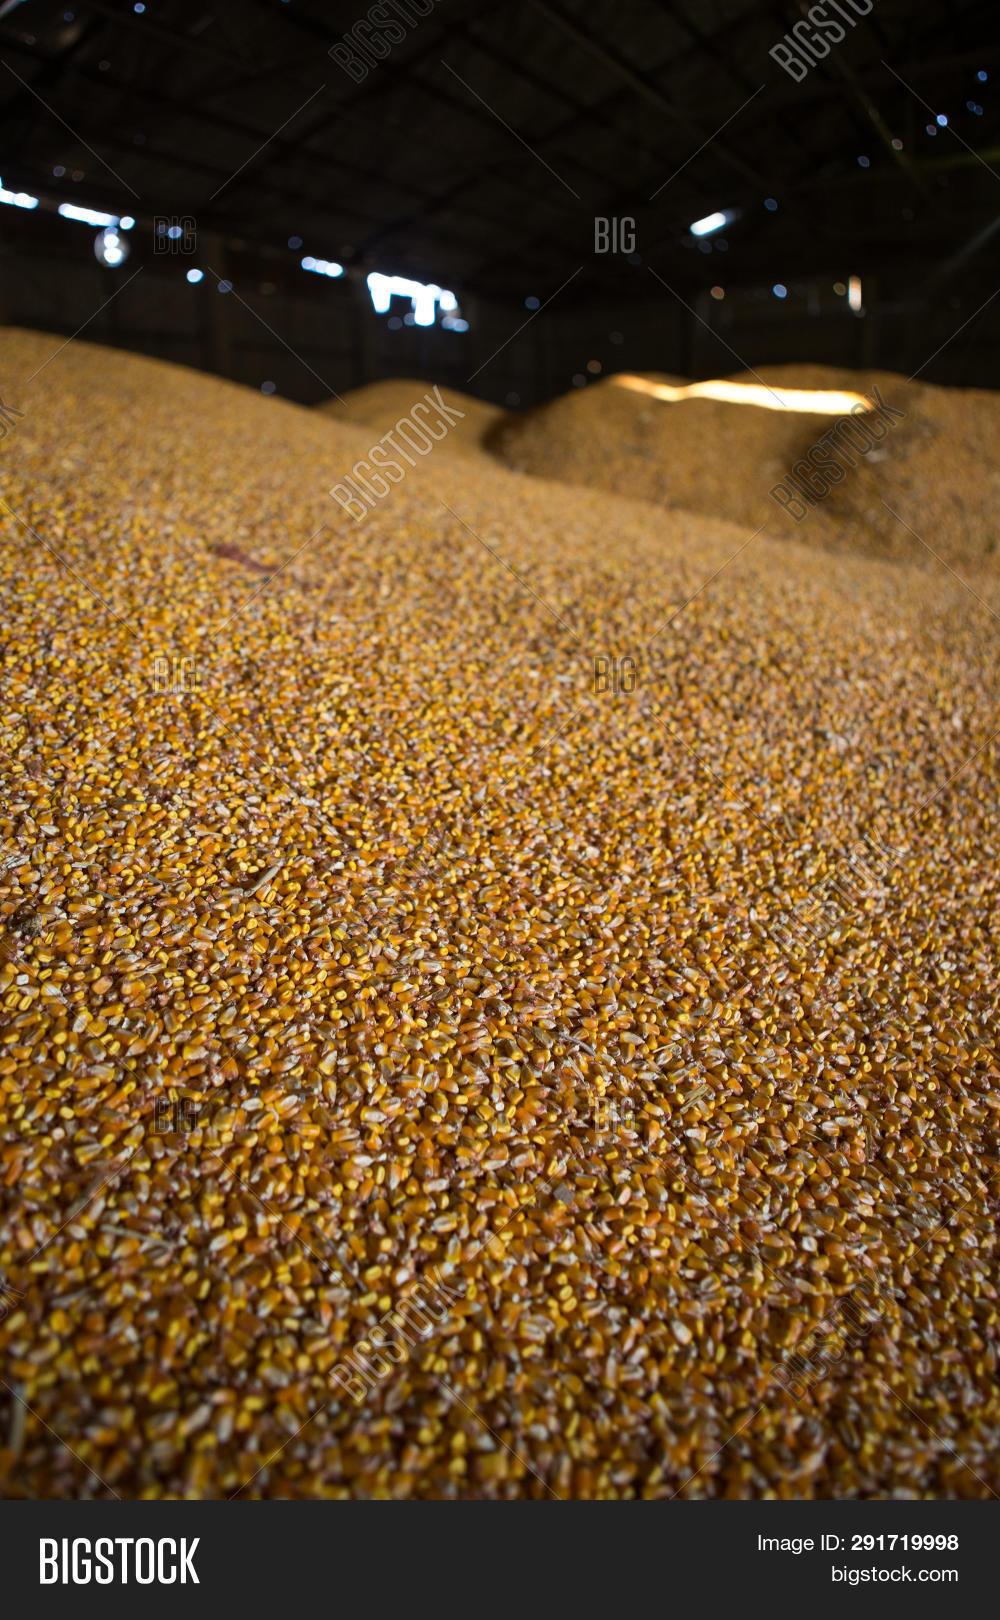 Shelter Storage Corn Image & Photo (Free Trial) | Bigstock